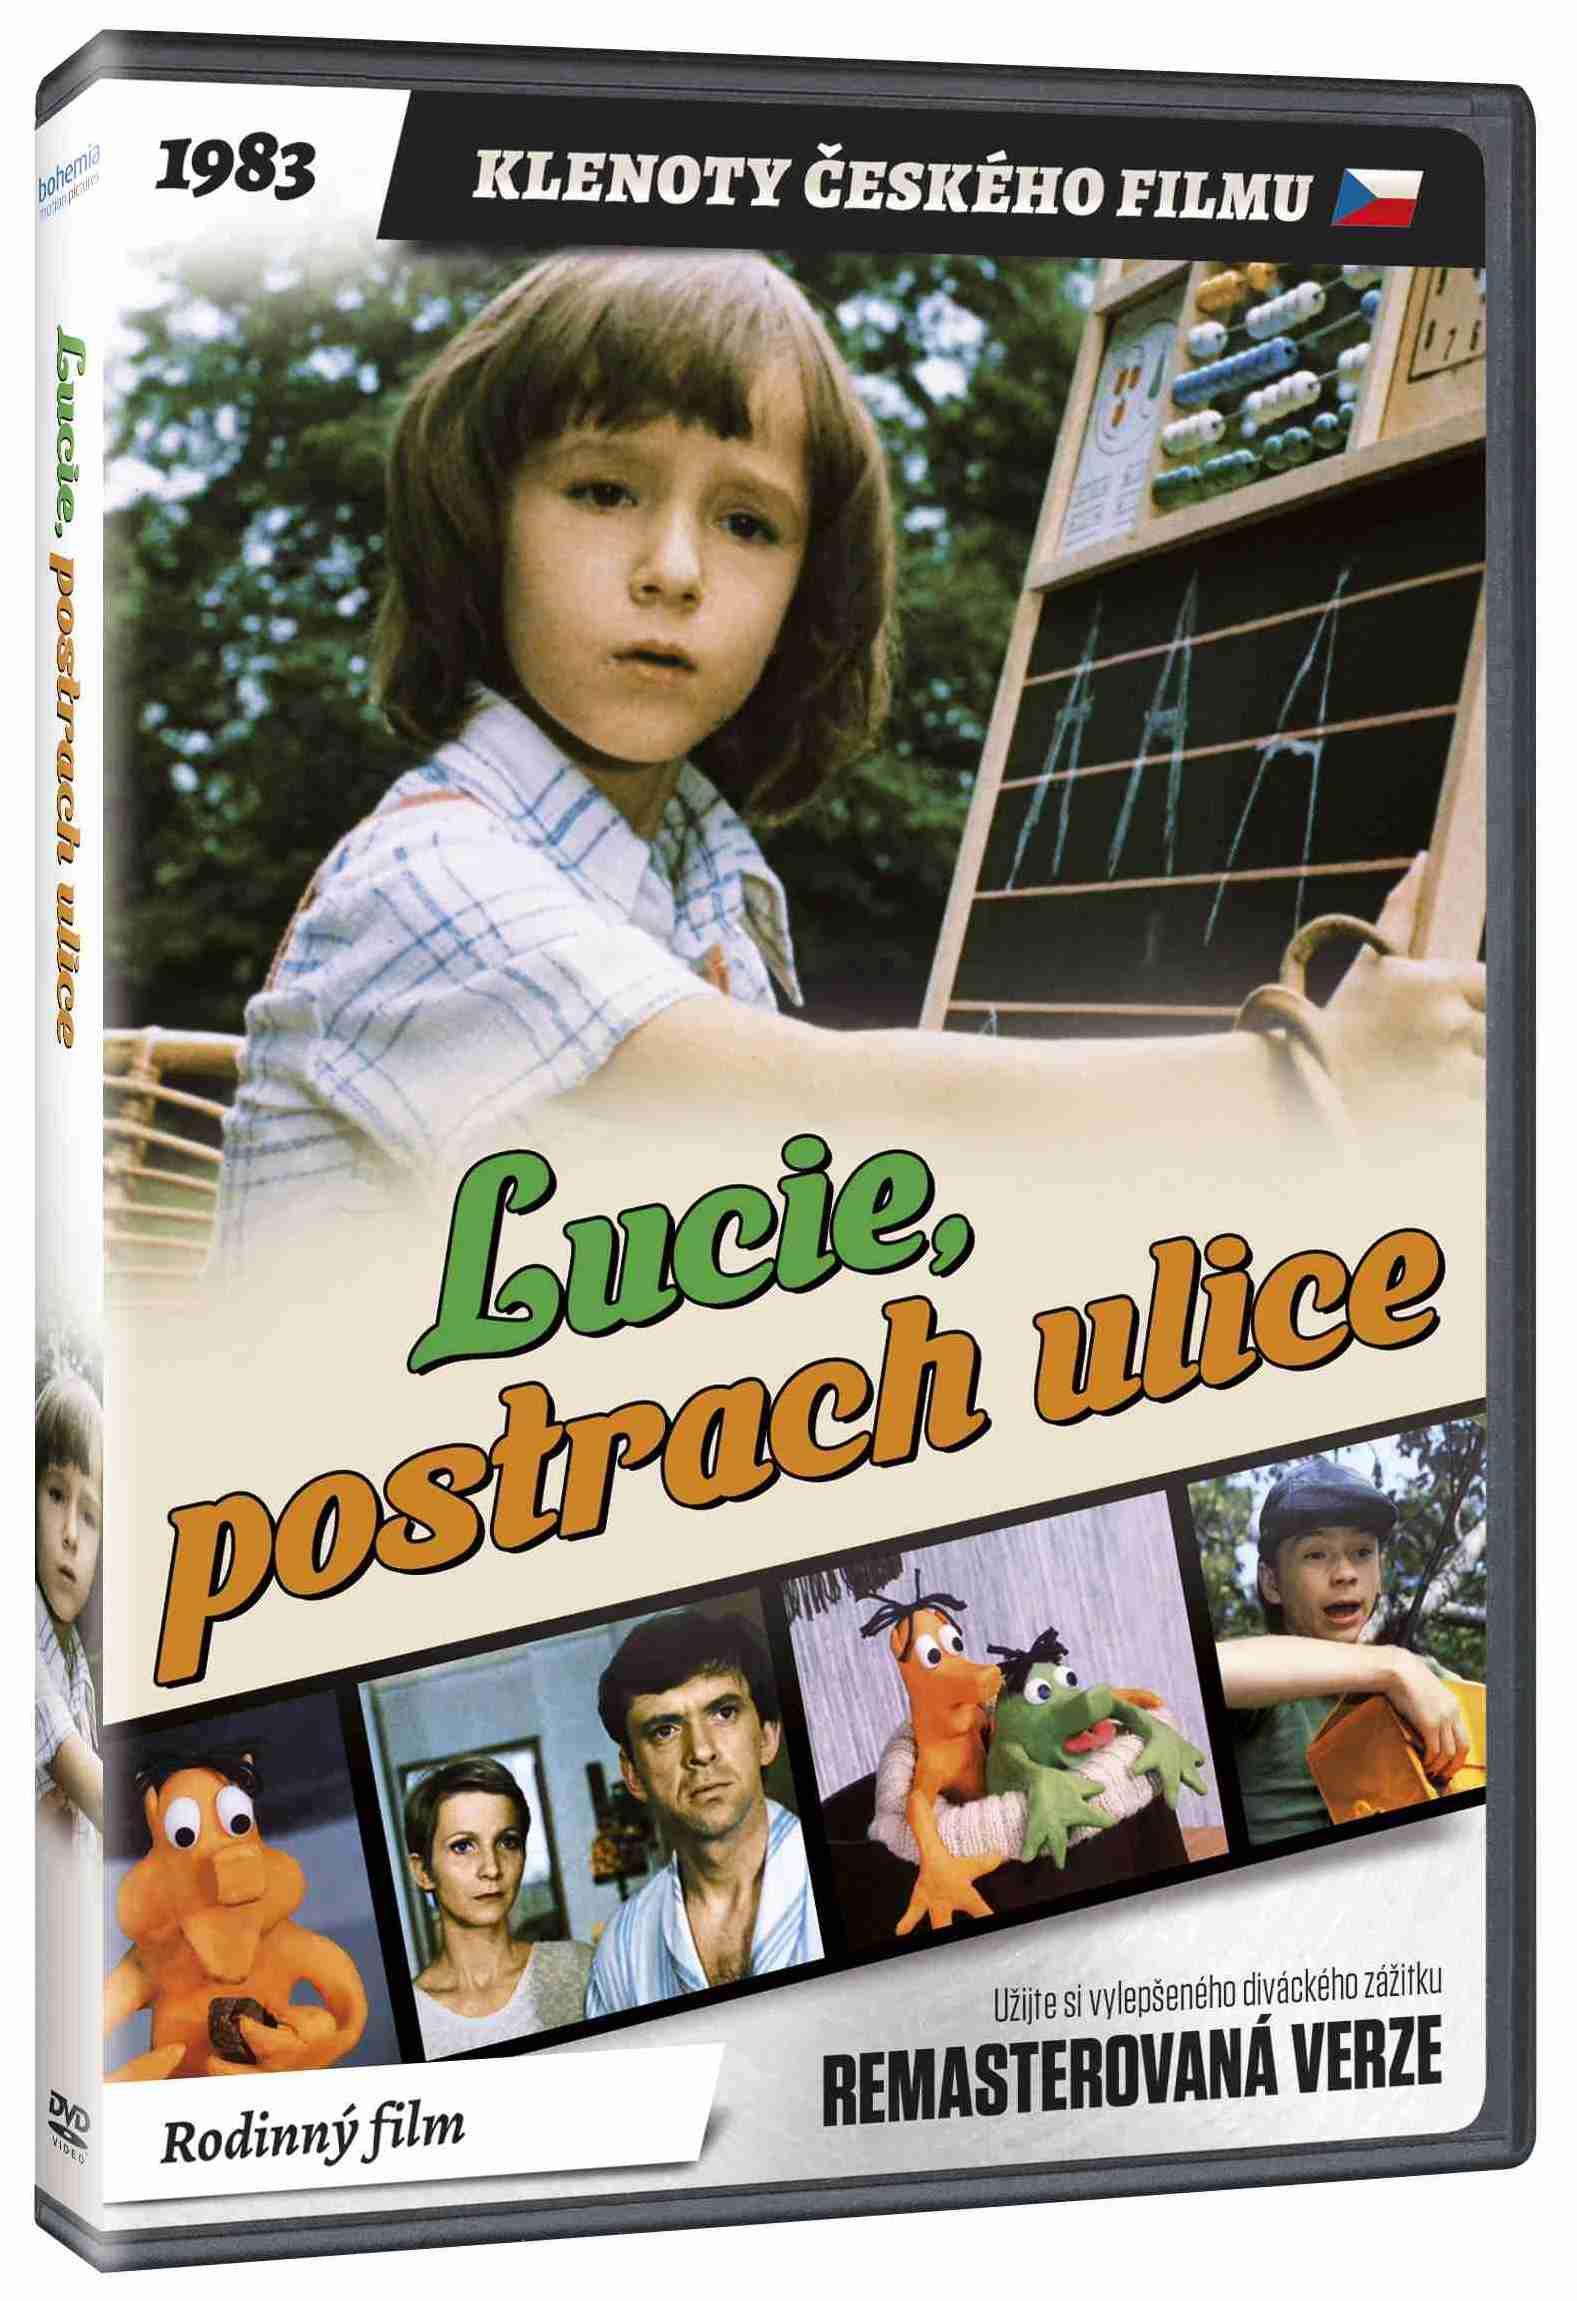 Lucie, postrach ulice (remasterovaná verze) - DVD